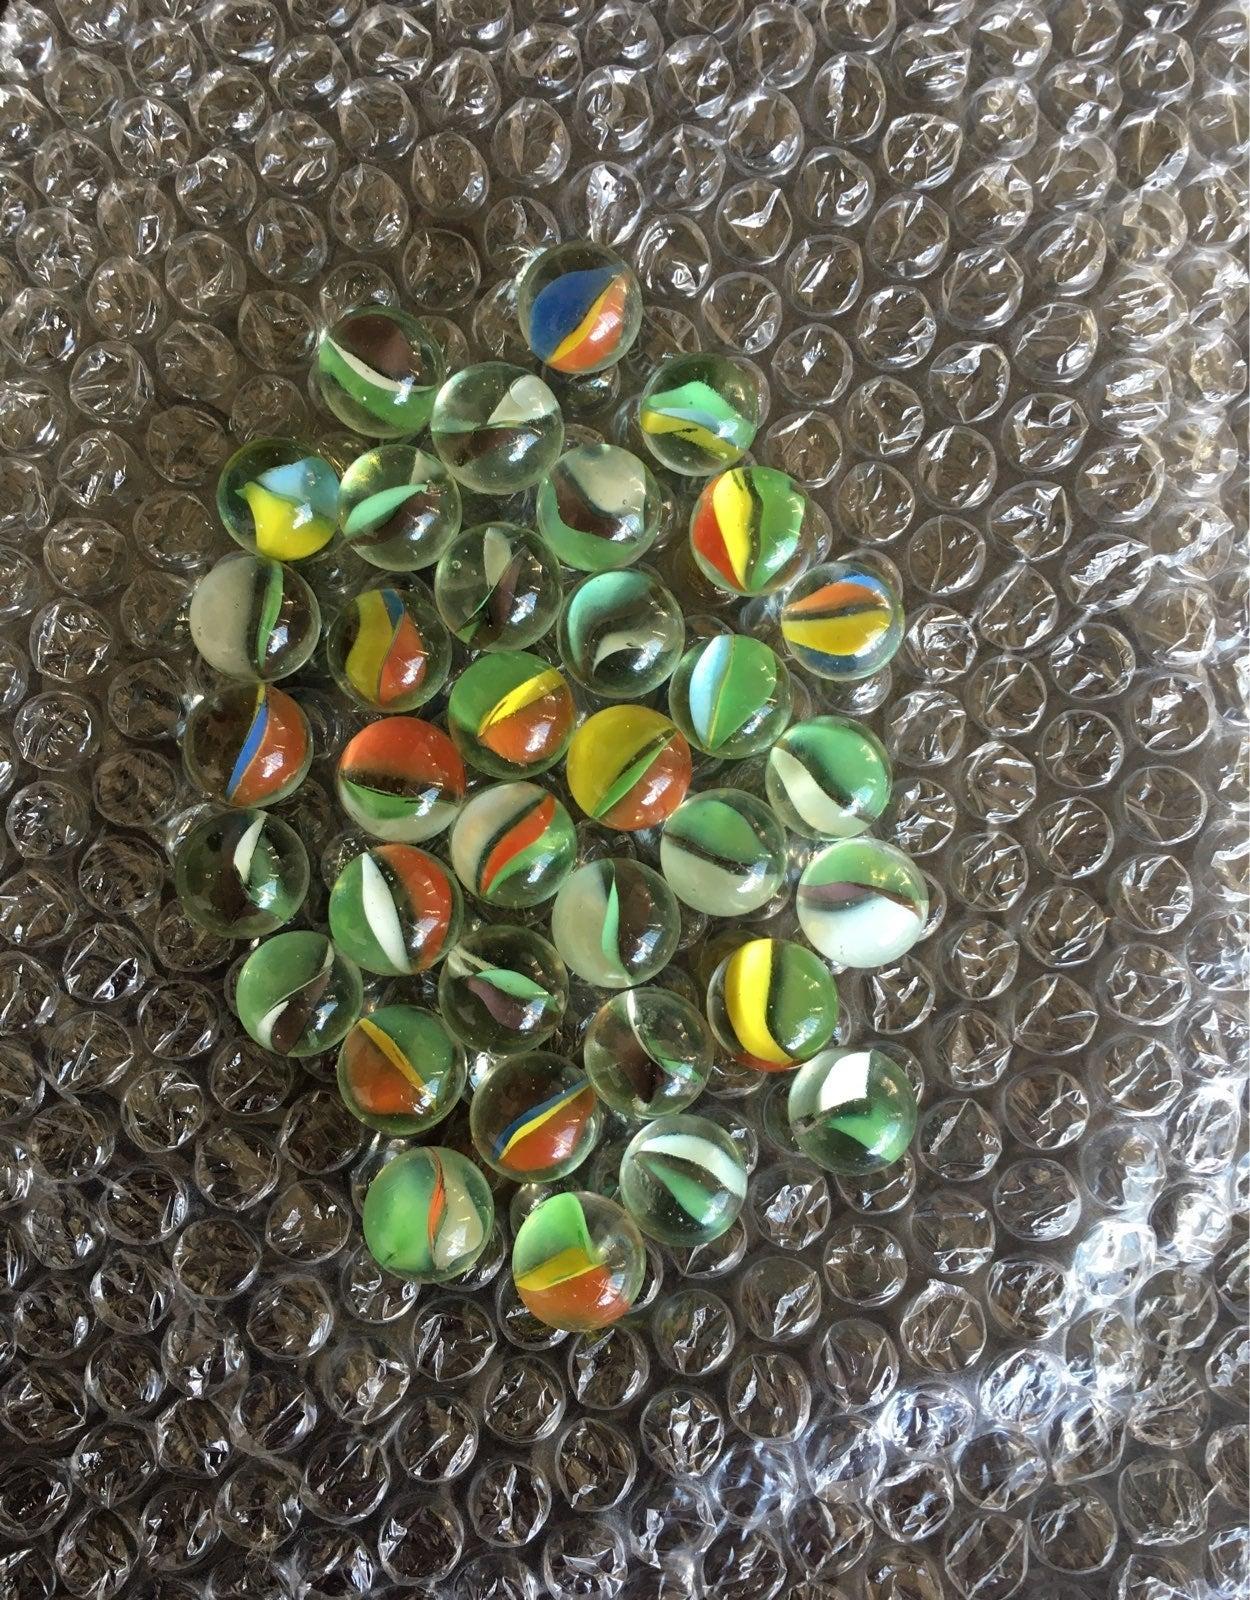 33 vintage marbles w/ vintage presto loc